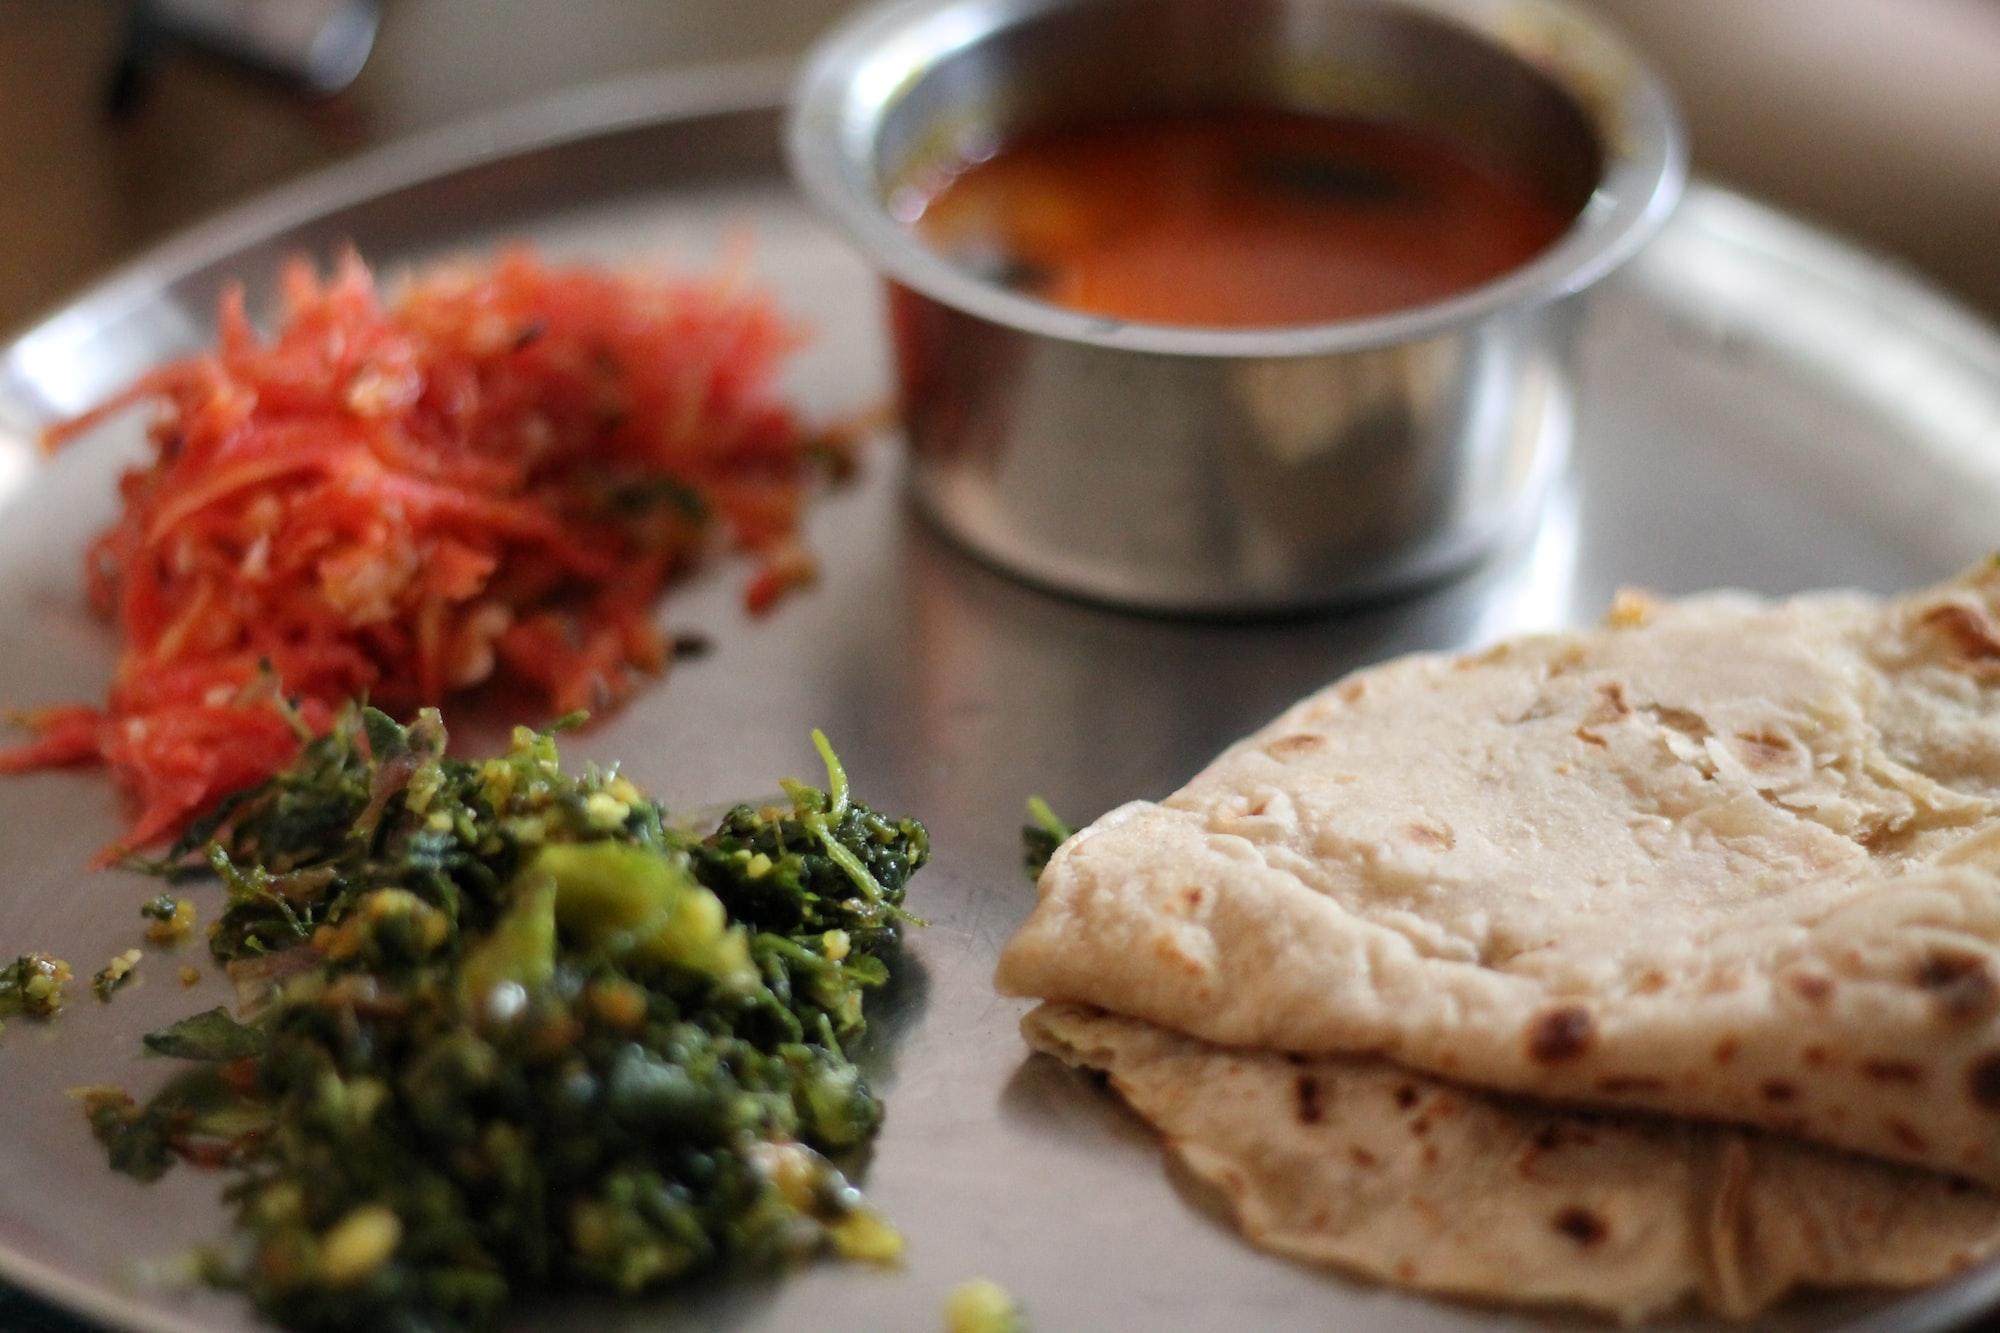 Indian meal, Lunch, Sabji, Salad, Chapati